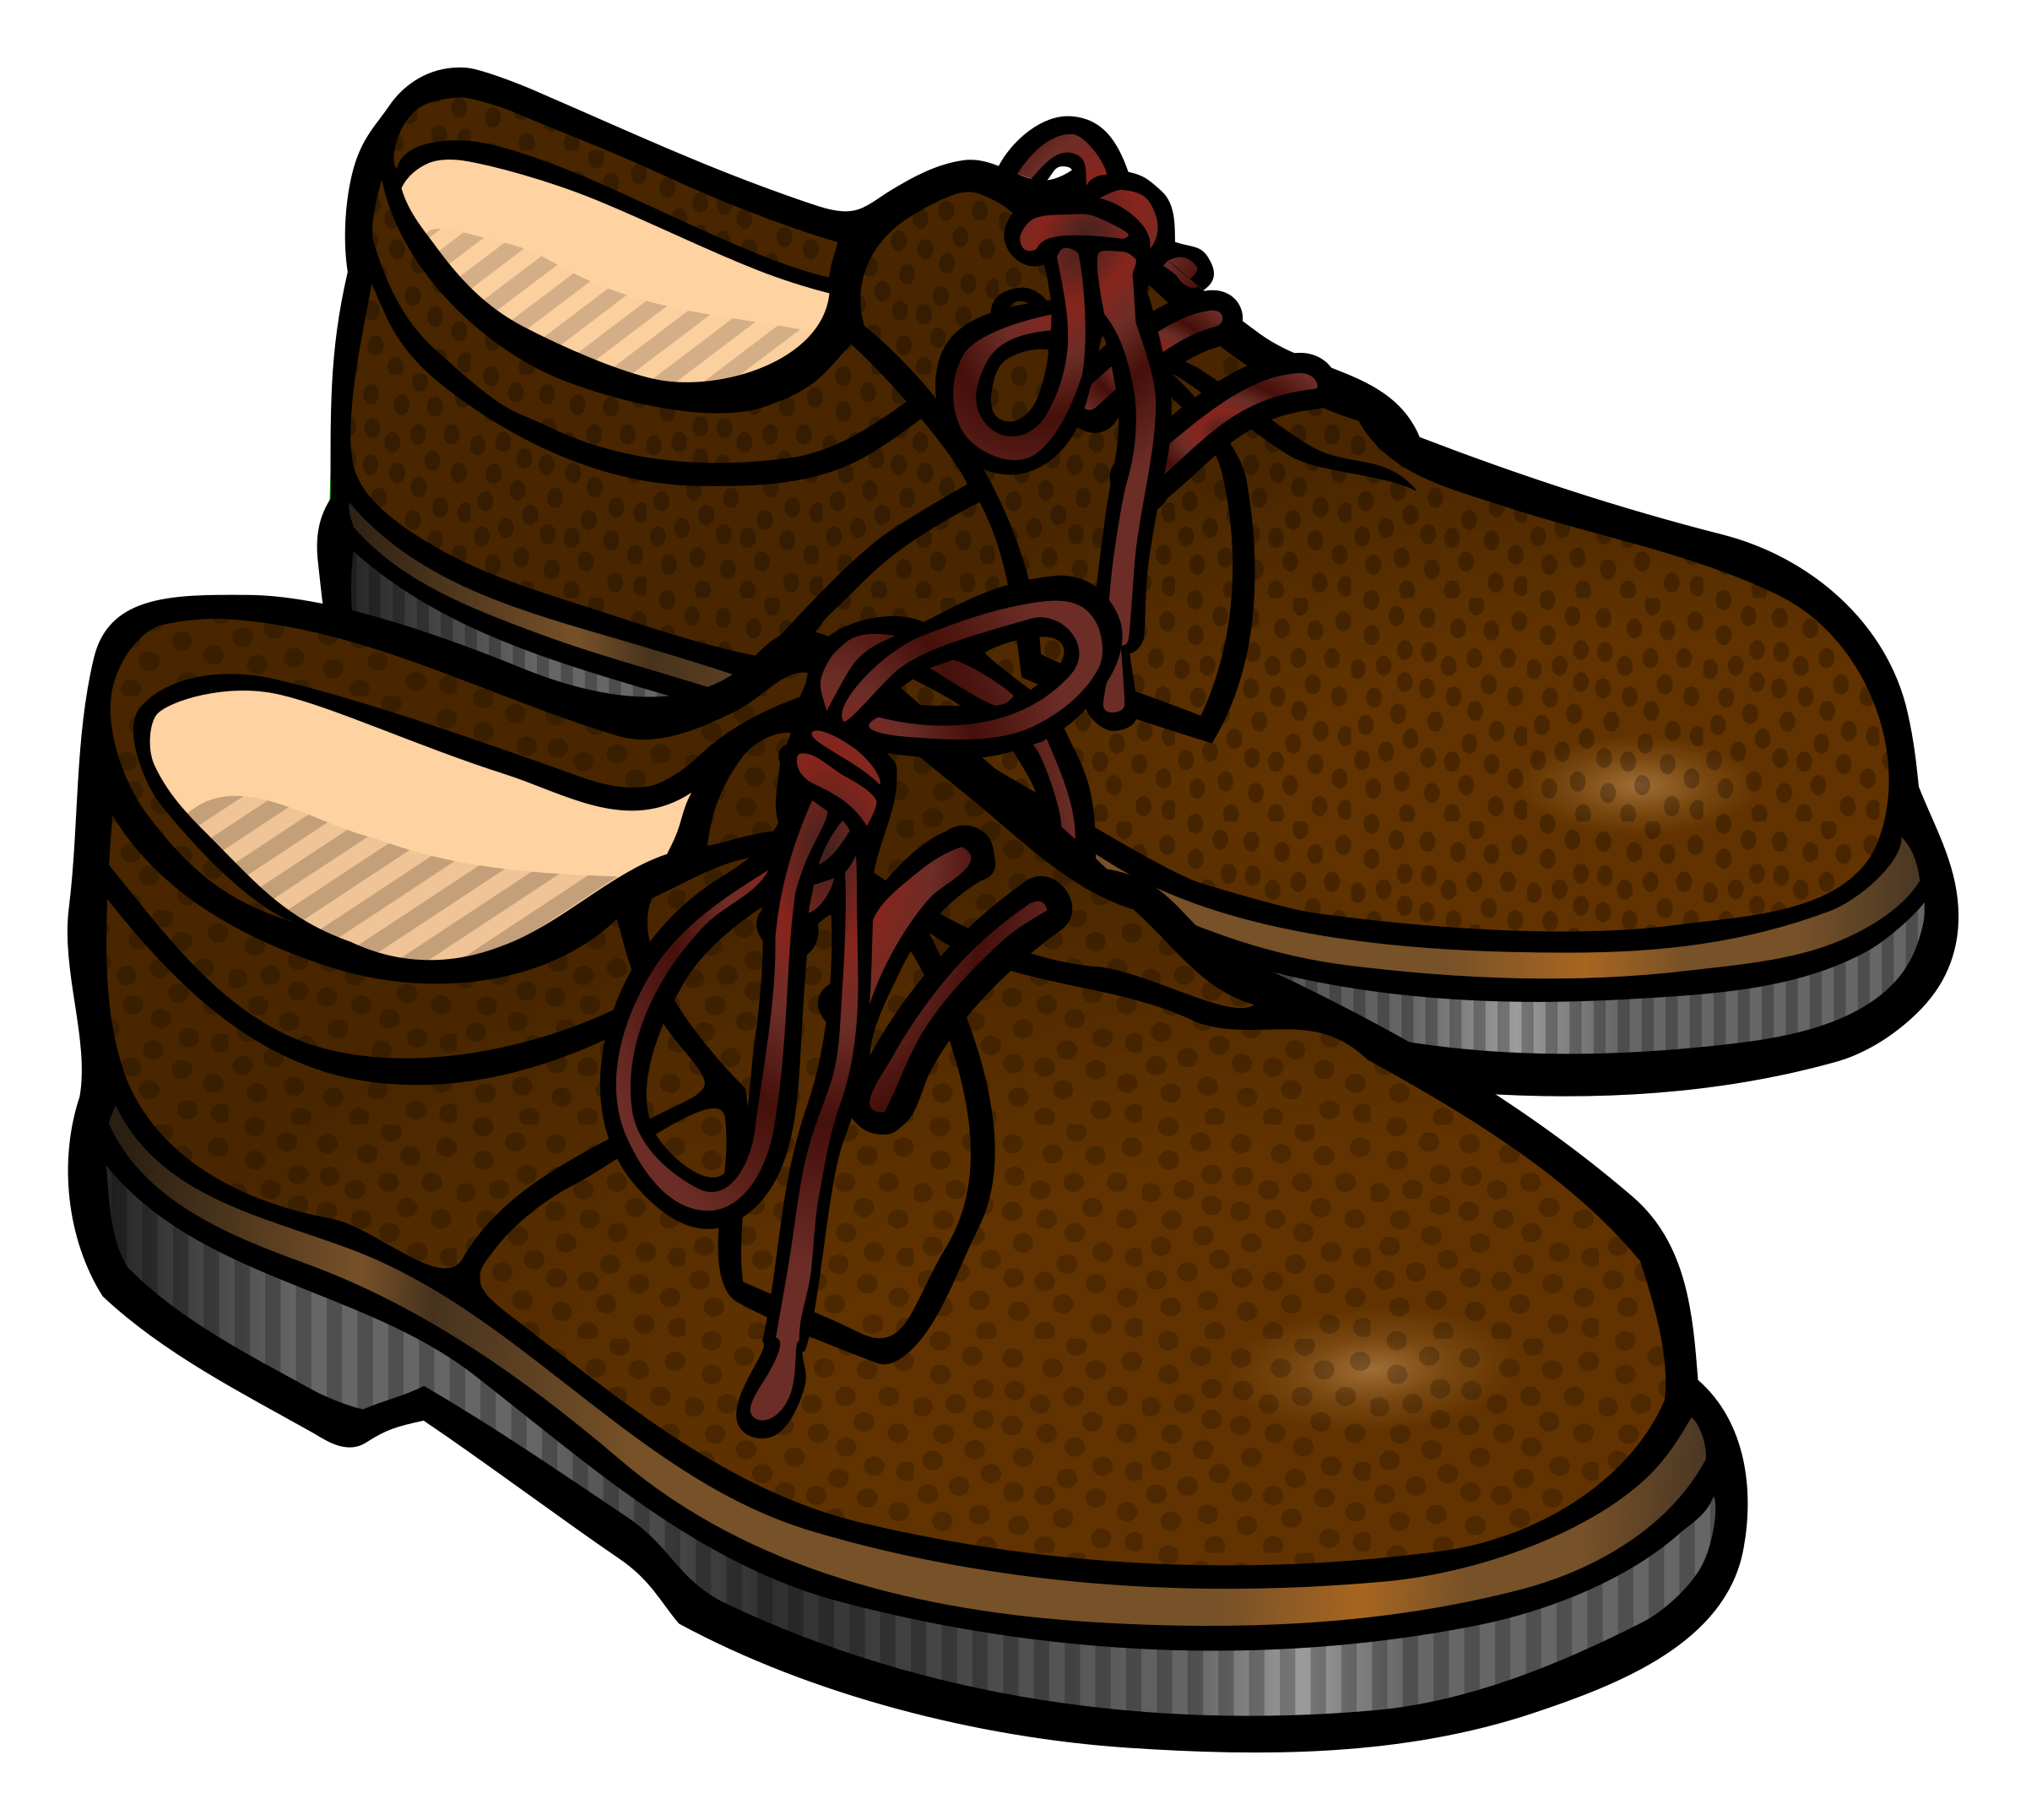 Shoes coloured image png. Big clipart big shoe